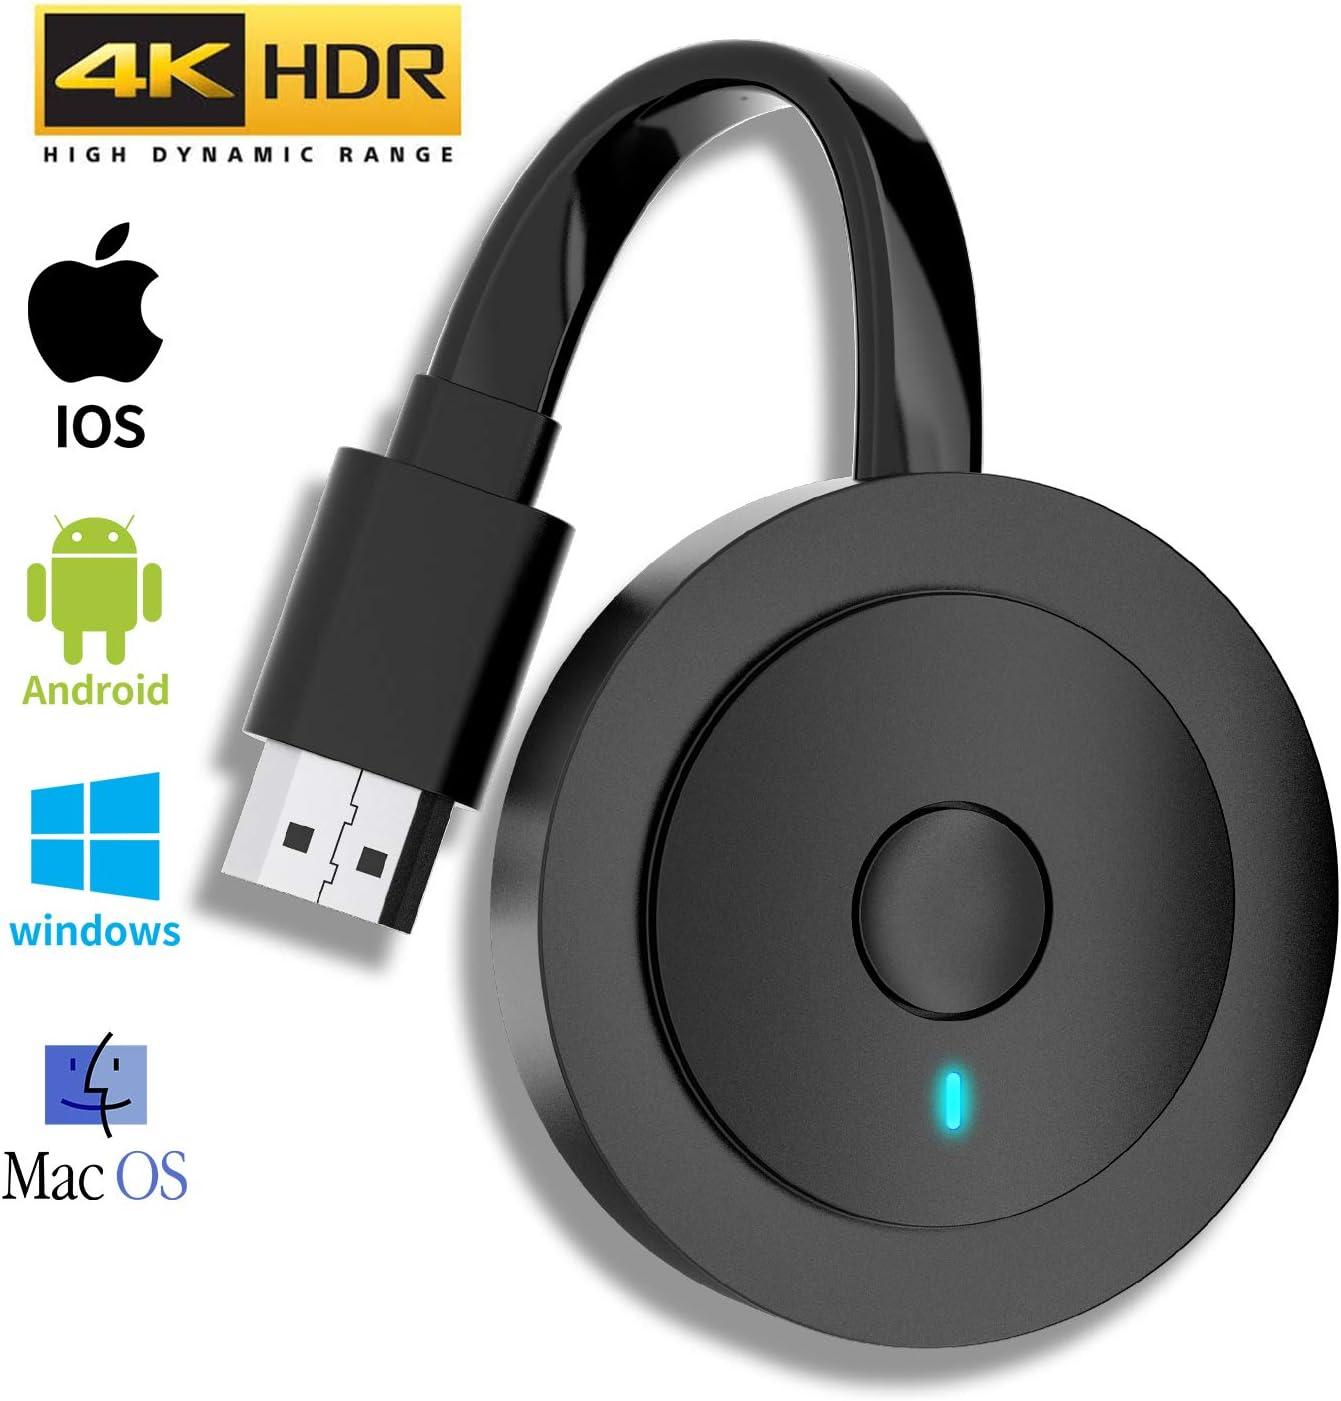 MPIO Wireless HDMI 4K HDR WiFi HDMI Dongle Streaming für Android ...